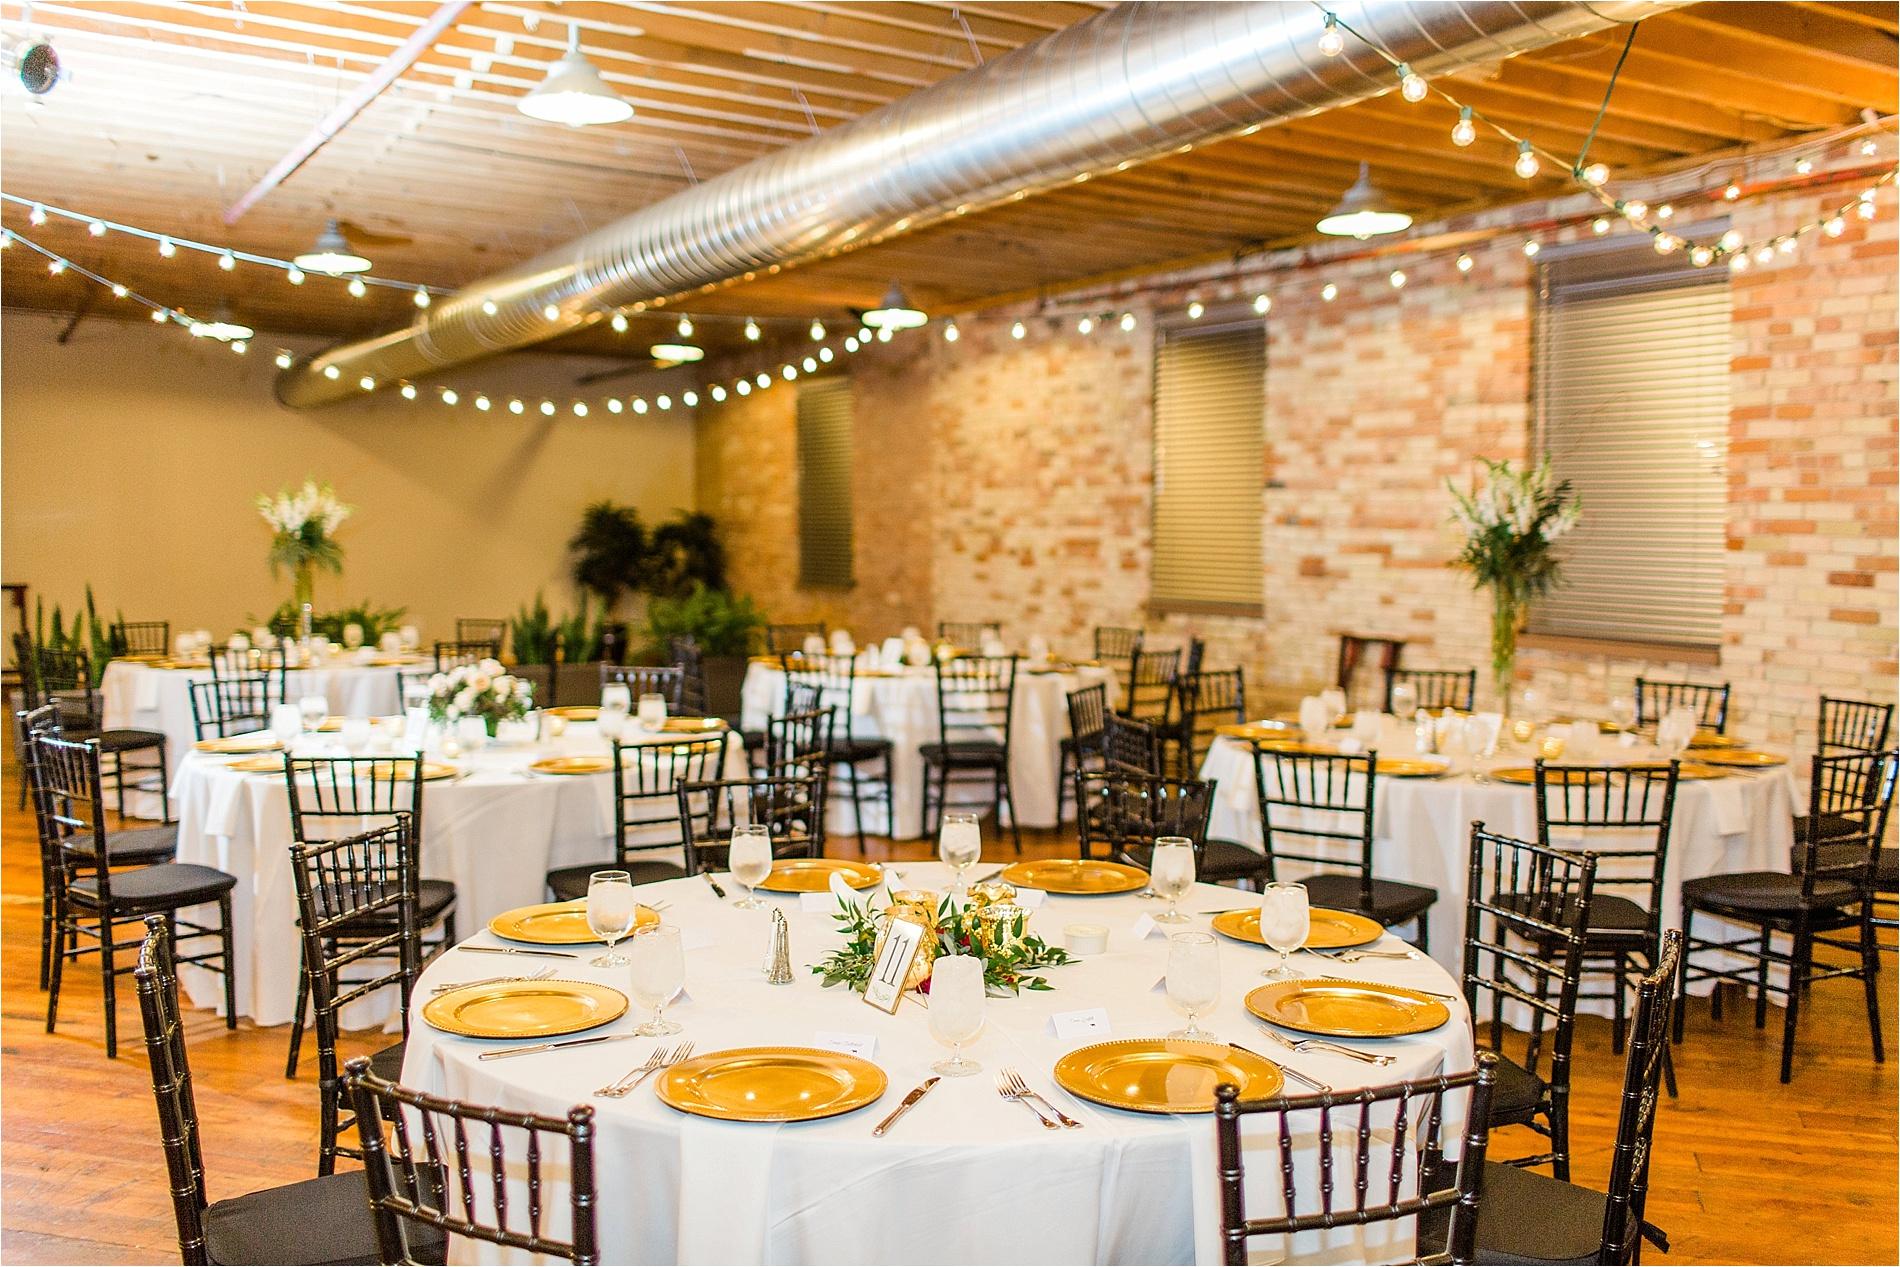 Grand Rapids Wedding Photographer Tifani Lyn Basilica Goei Center Carolyn Kyle 0065